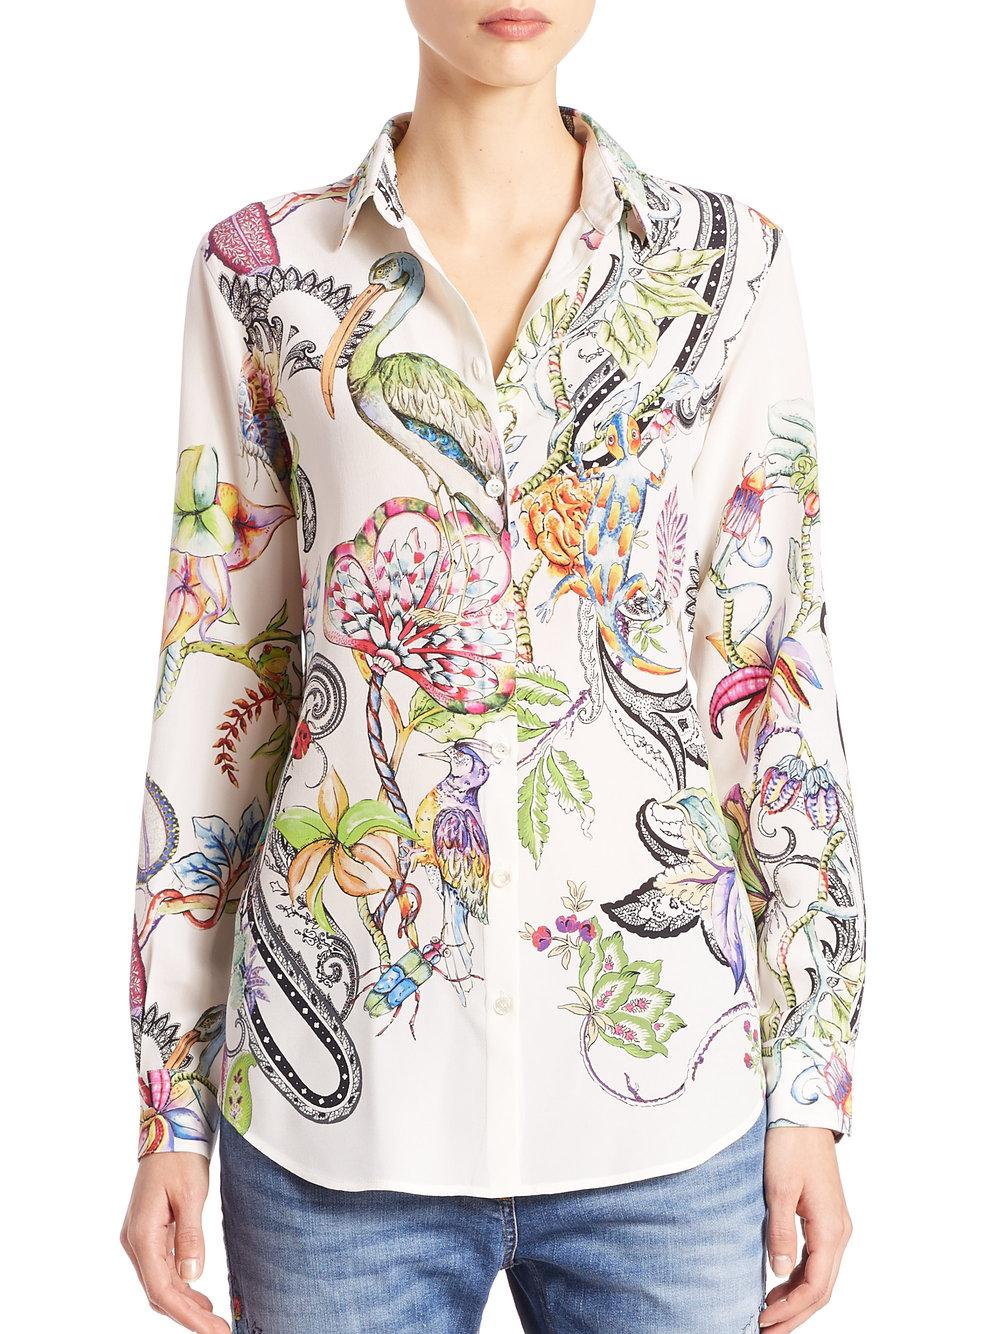 etro-white-silk-wildlife-print-shirt-product-0-003198085-normal.jpg